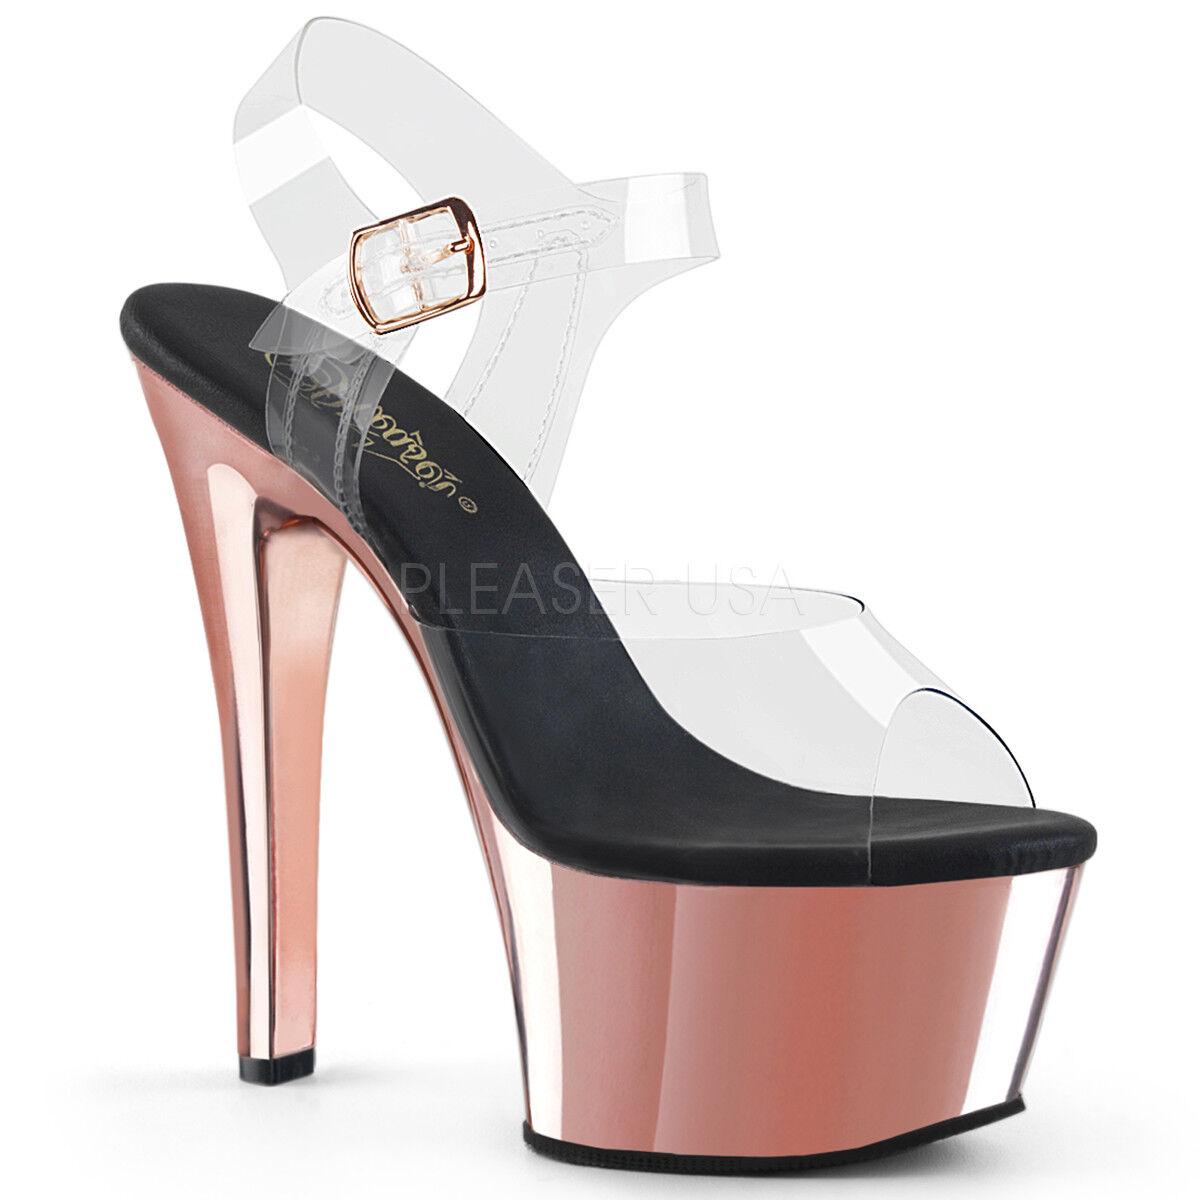 PLEASER 6  Heel Comfortable Rose or Chrome Platform Stripper Ankle Strap chaussures